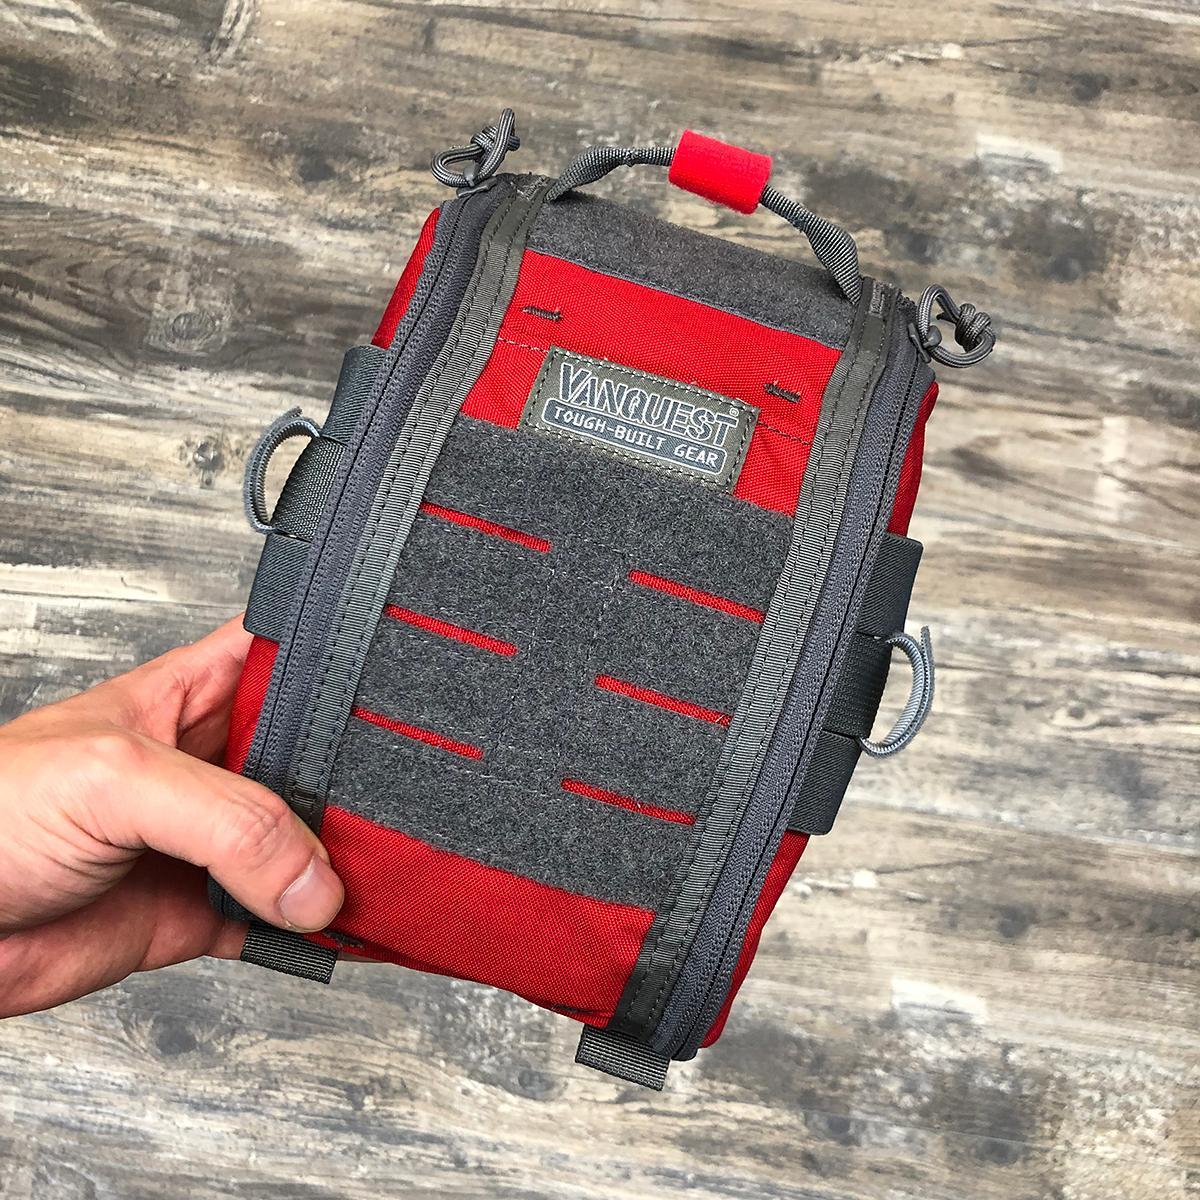 Fatpack 5X8 (Gen-2) First Aid Trauma Pack - Rot